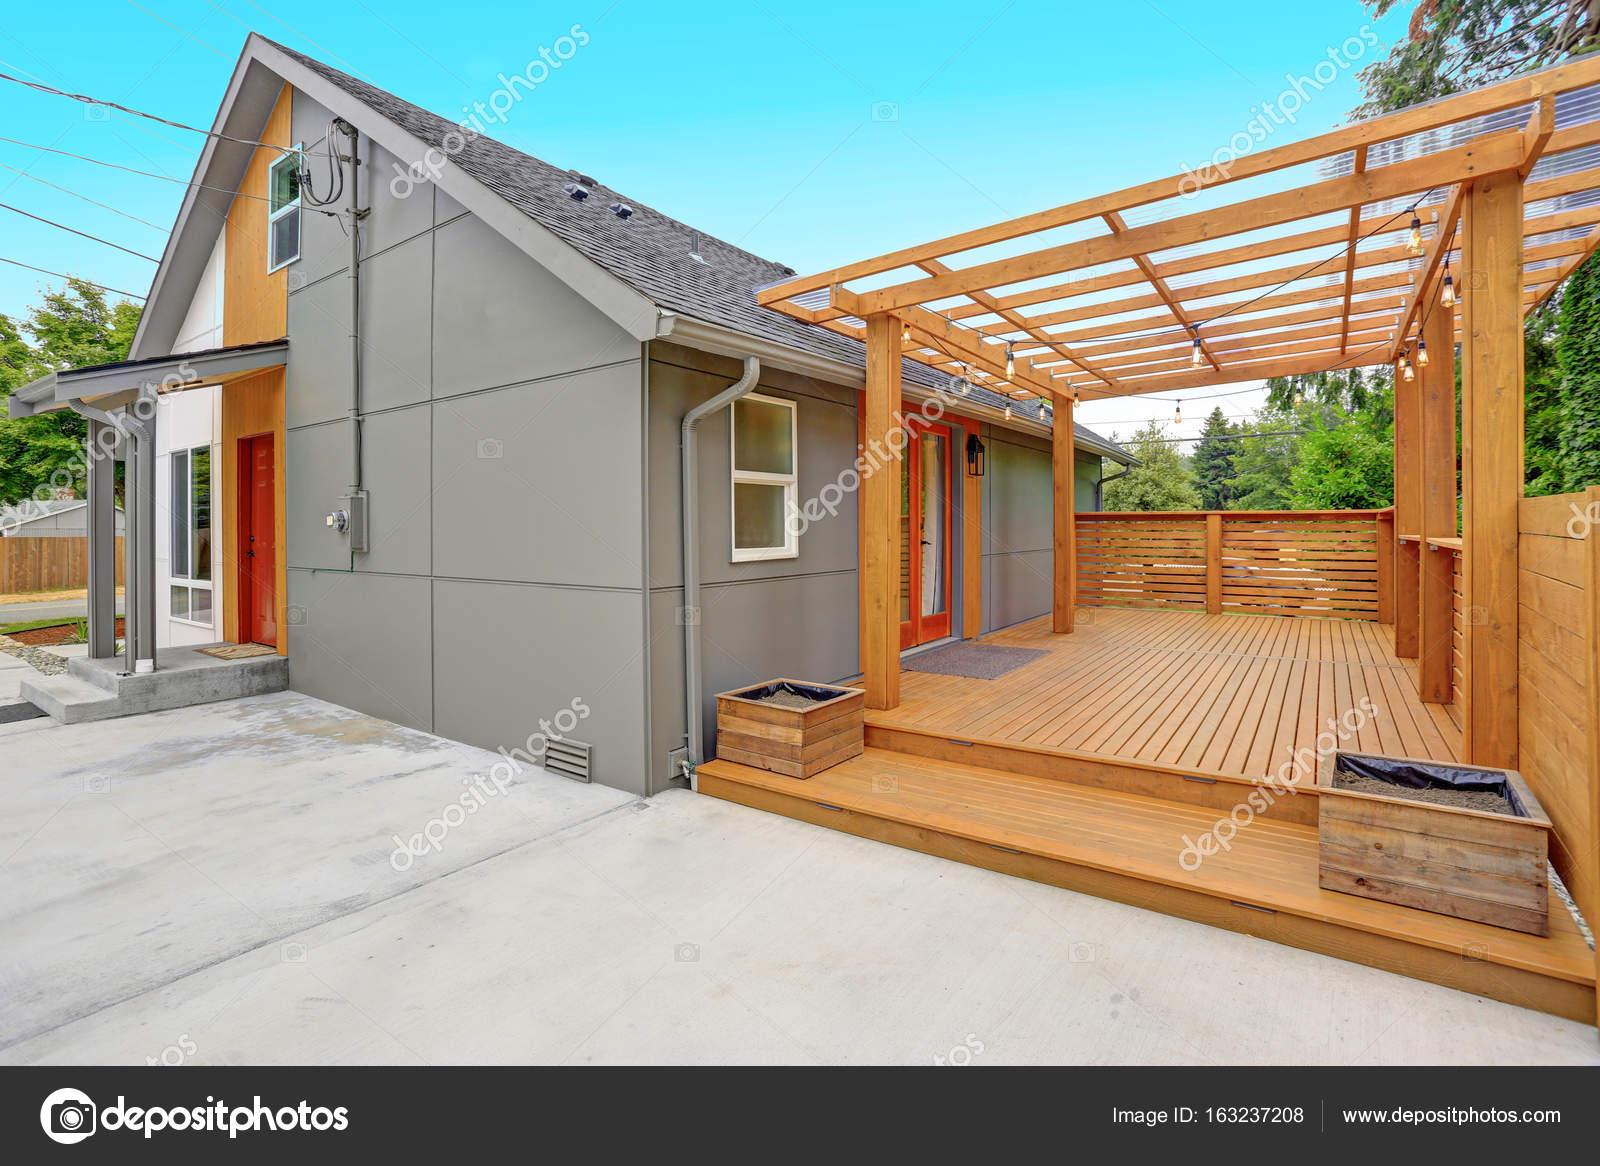 Geheel gerenoveerd modern huis in everett u2014 stockfoto © alabn #163237208